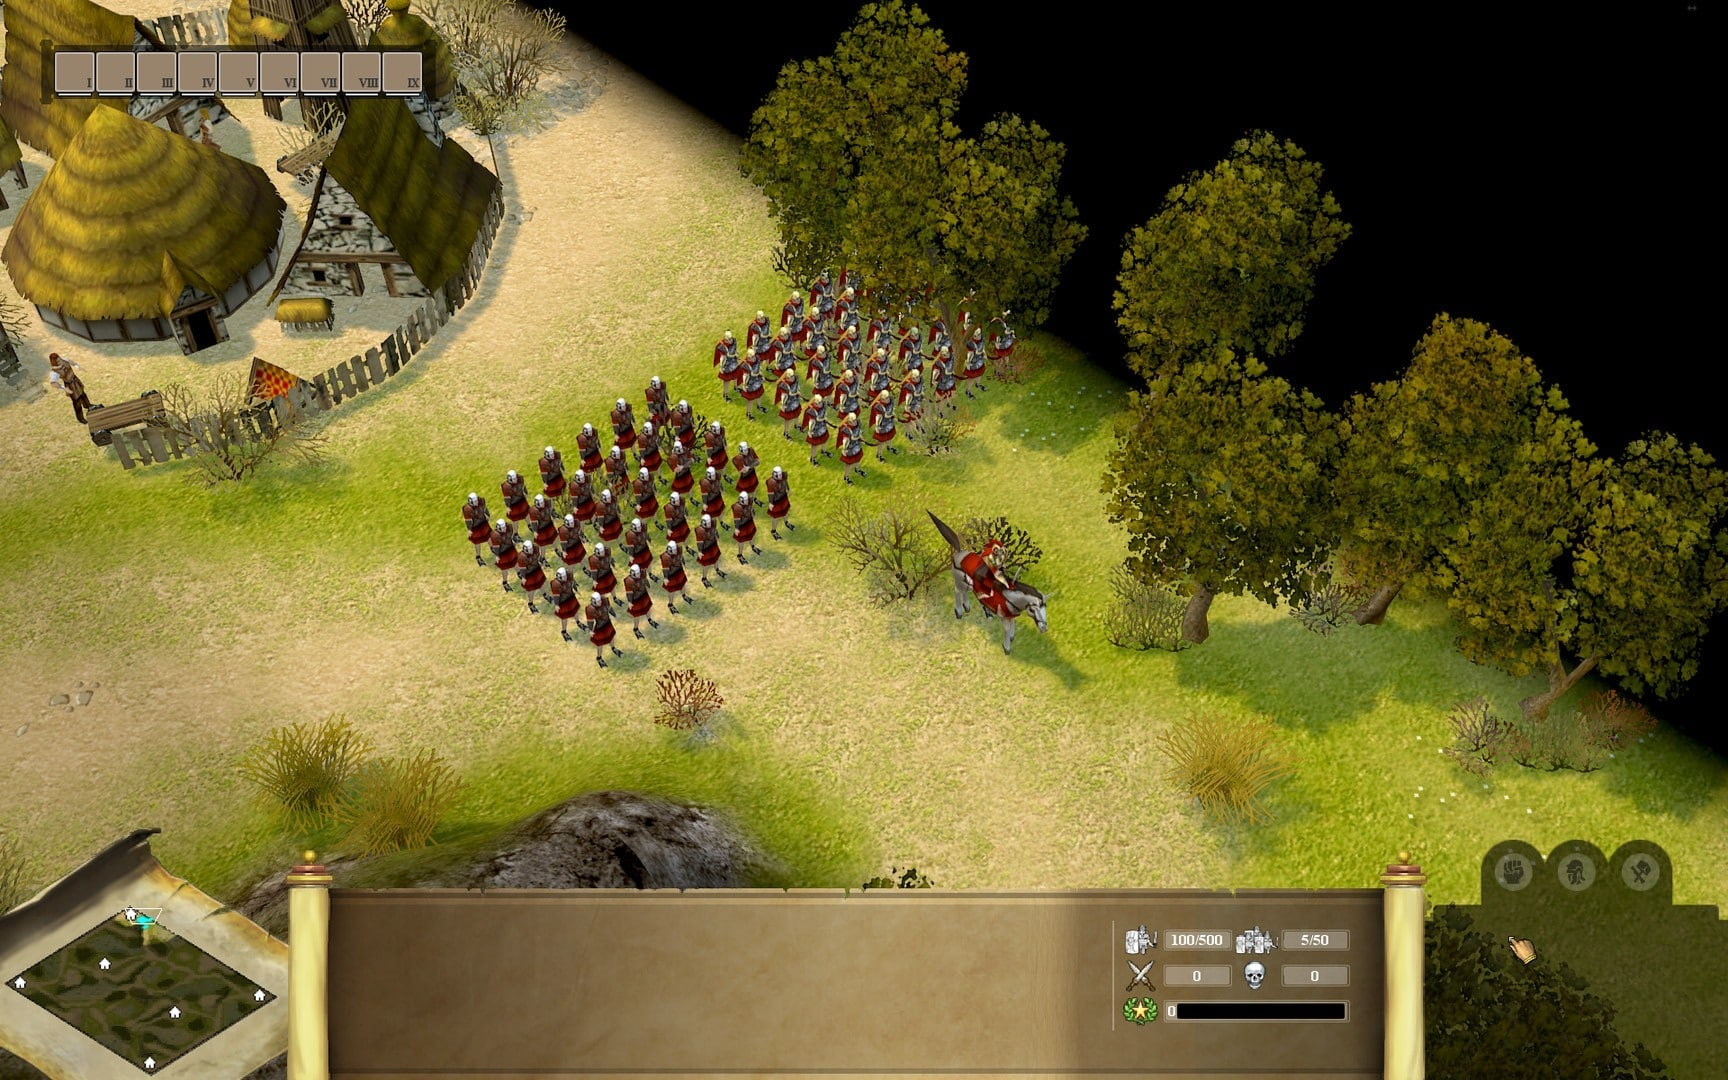 commandos-2-hd-remaster-praetorians-hd-remaster (4)